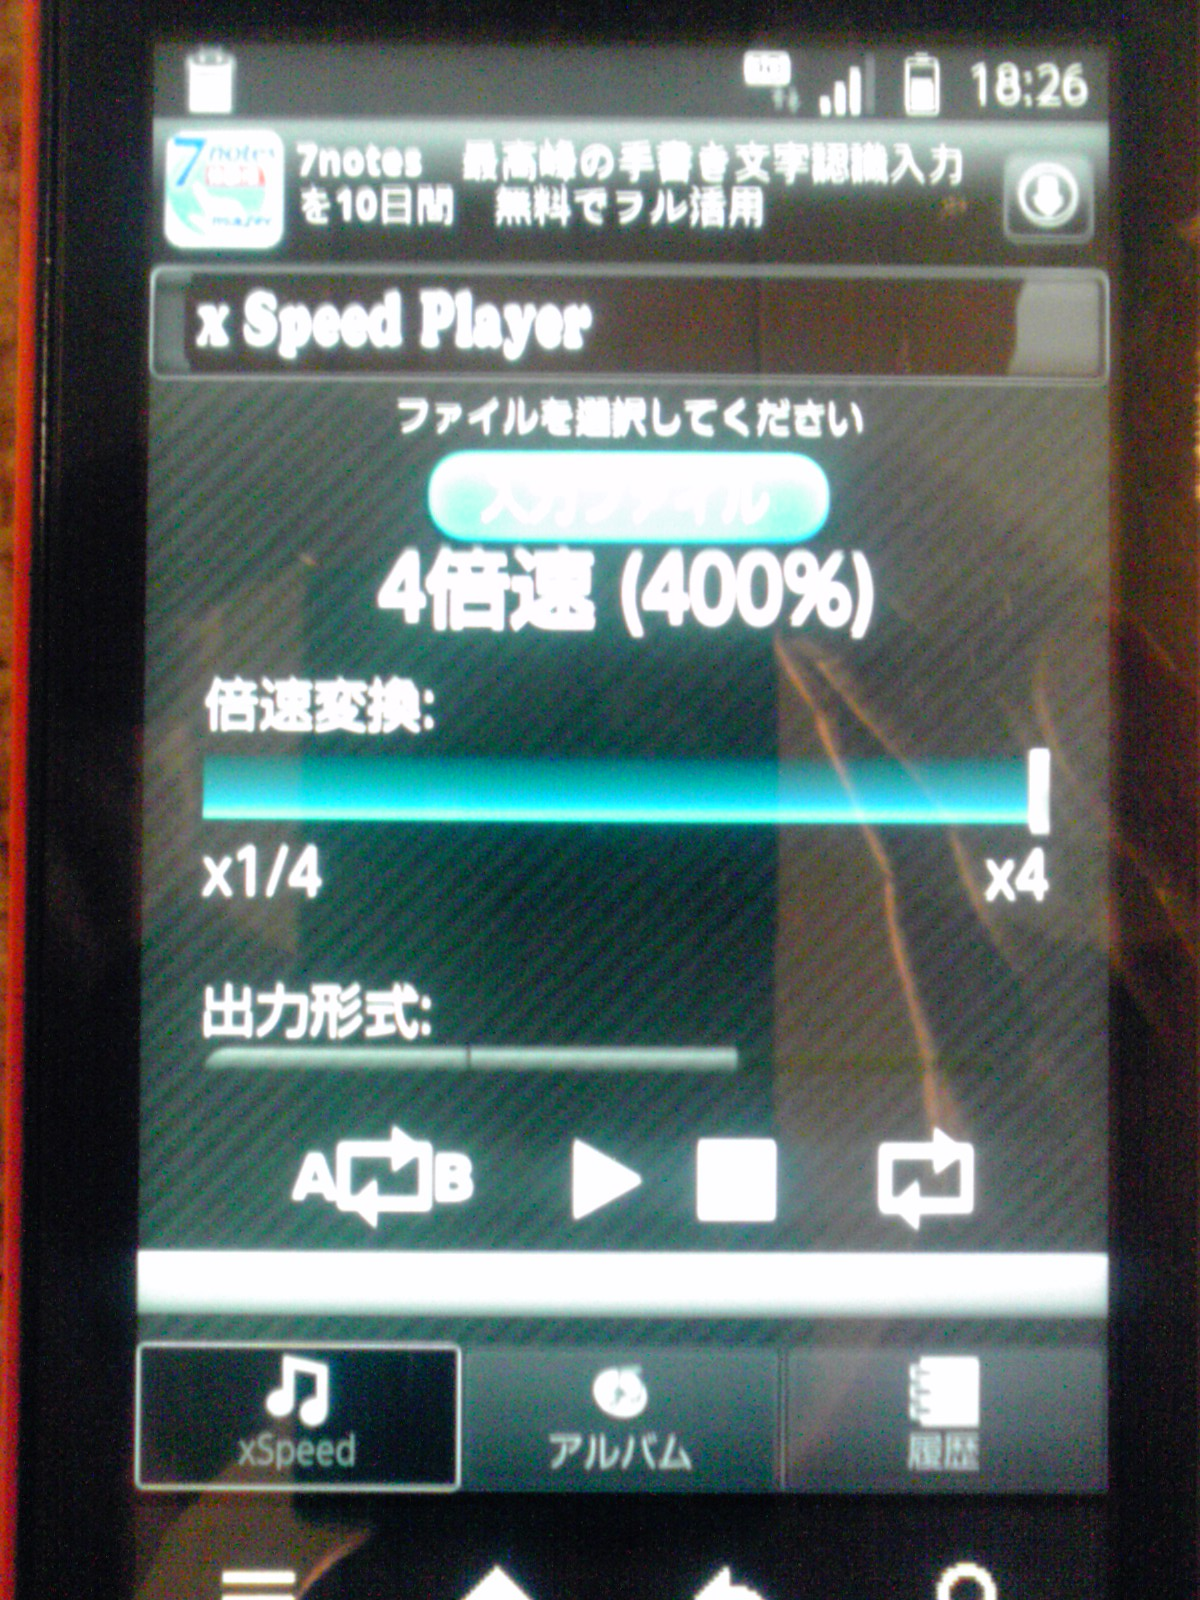 x Speed Player